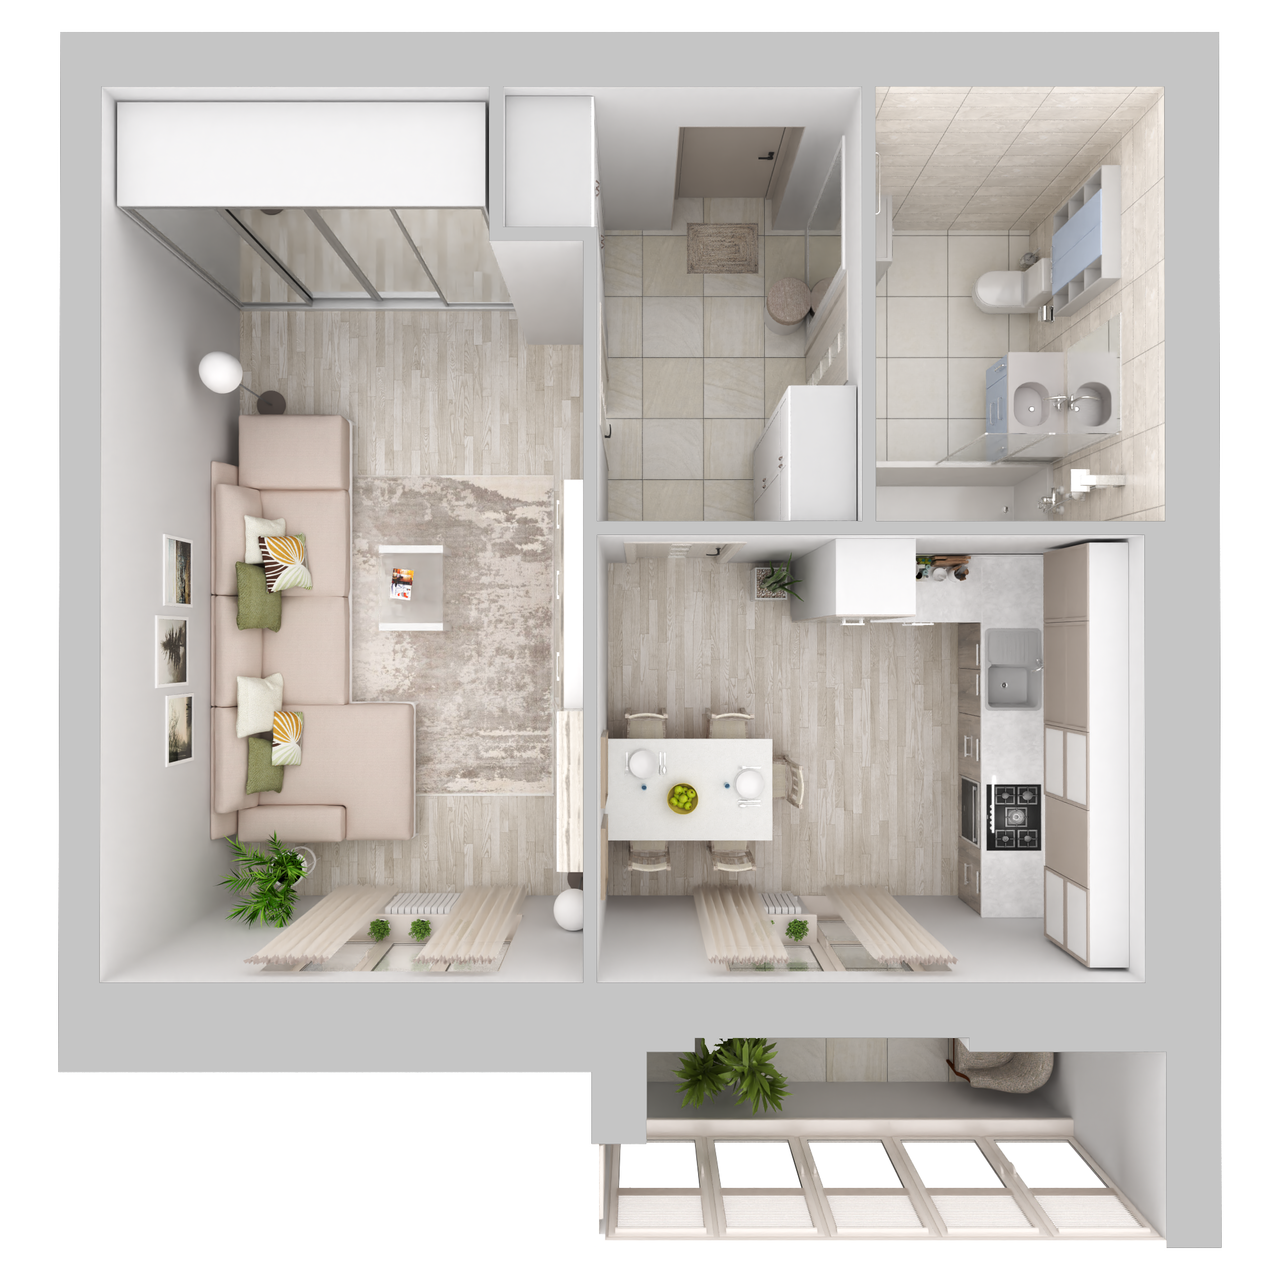 Дом 6 - 1-комнатная №111